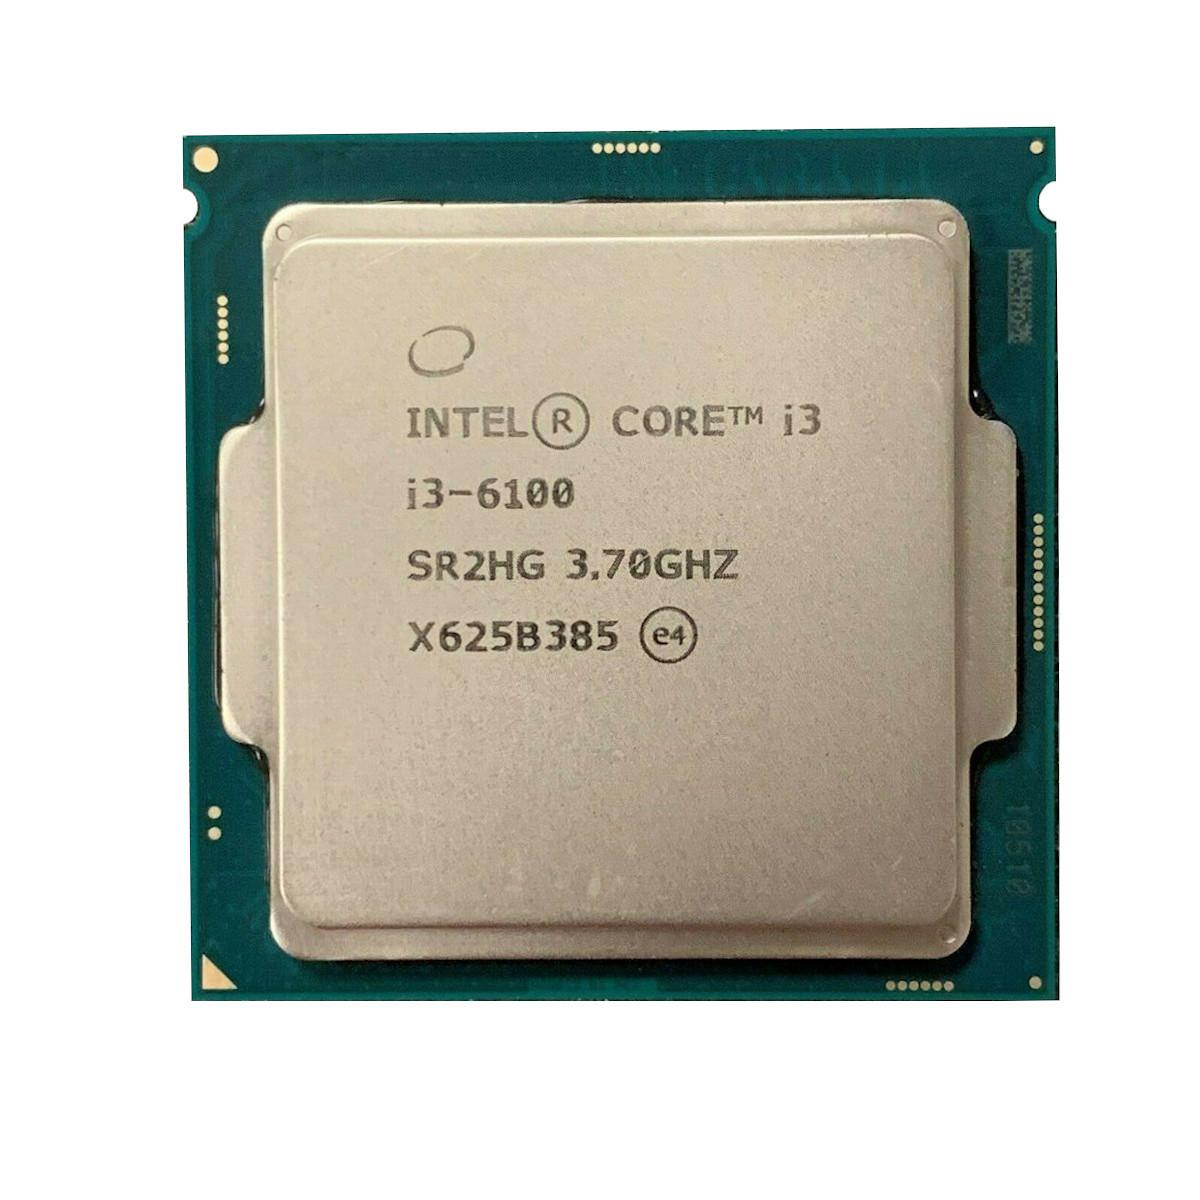 Процессор Intel 1151 Core i3-6100, 3,7GHz